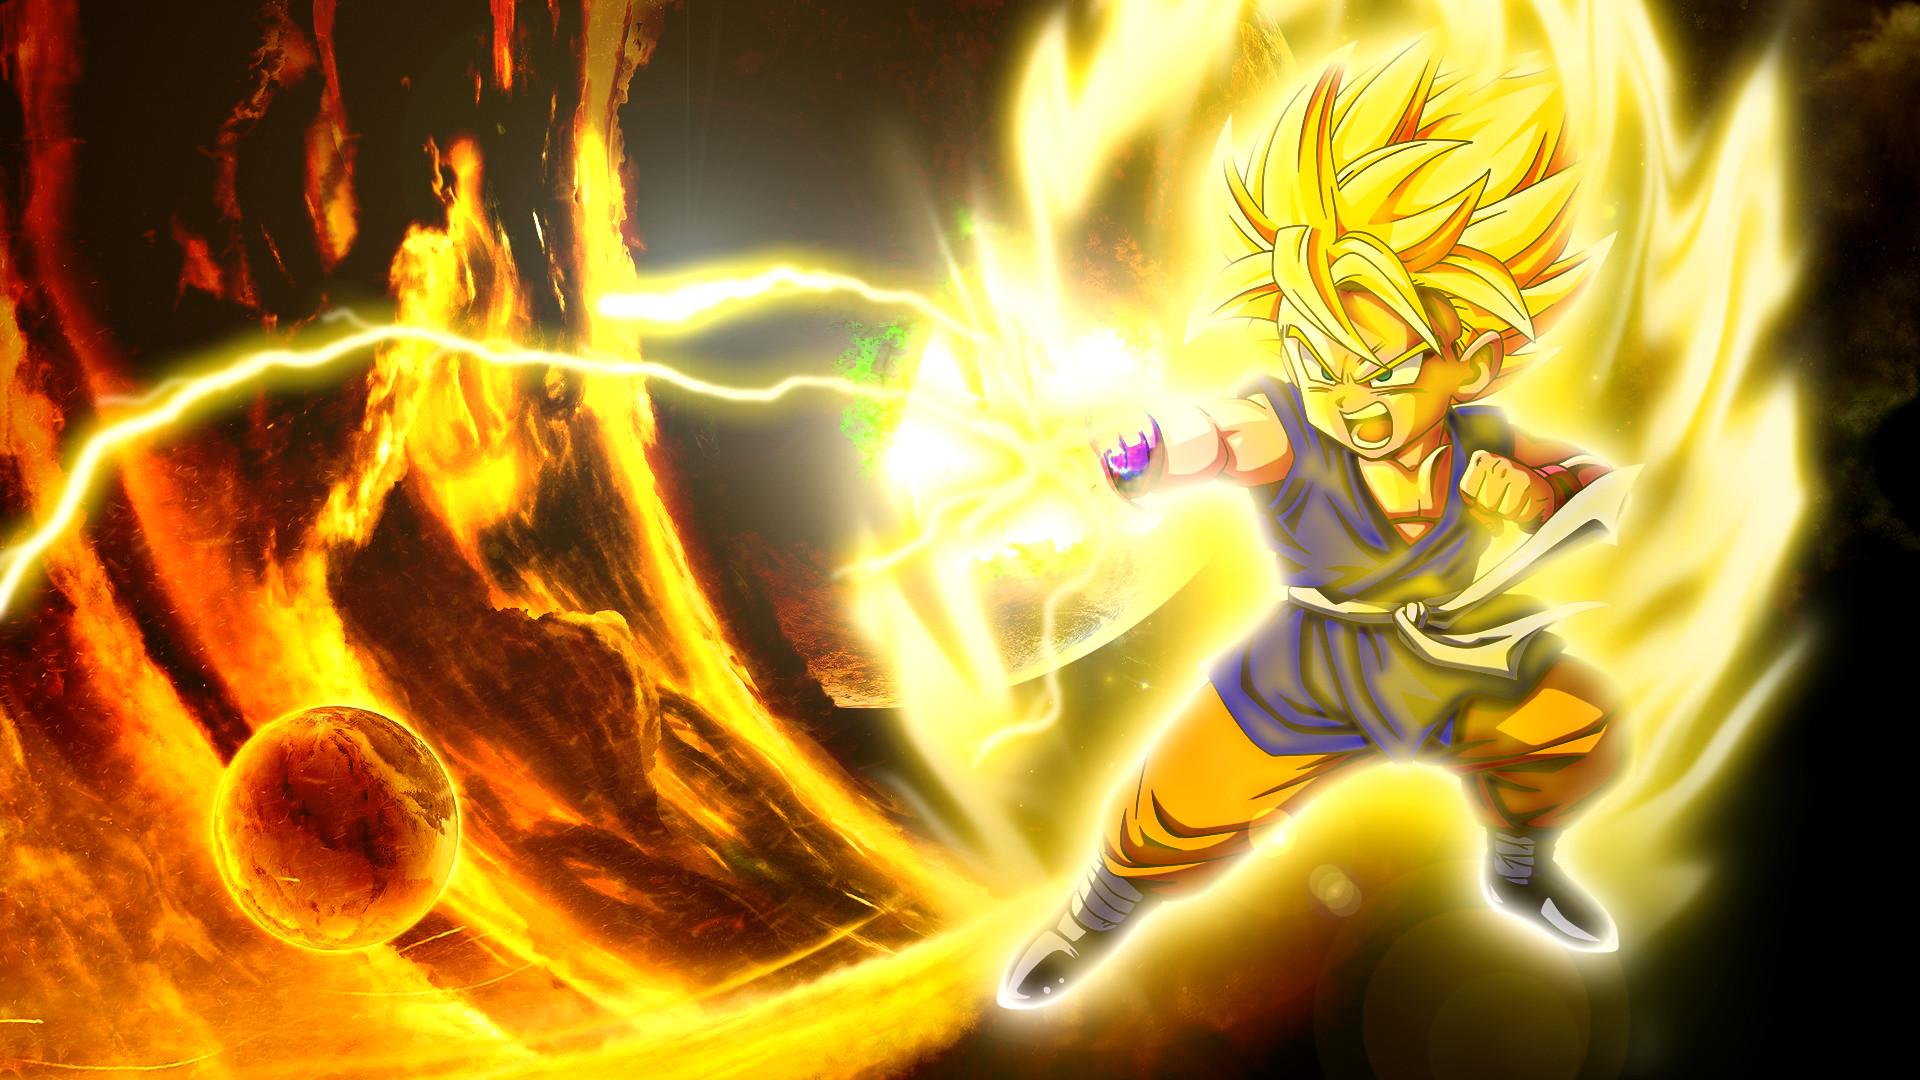 Kid Goku Dragon Ball Z by UzumakiAsh on DeviantArt